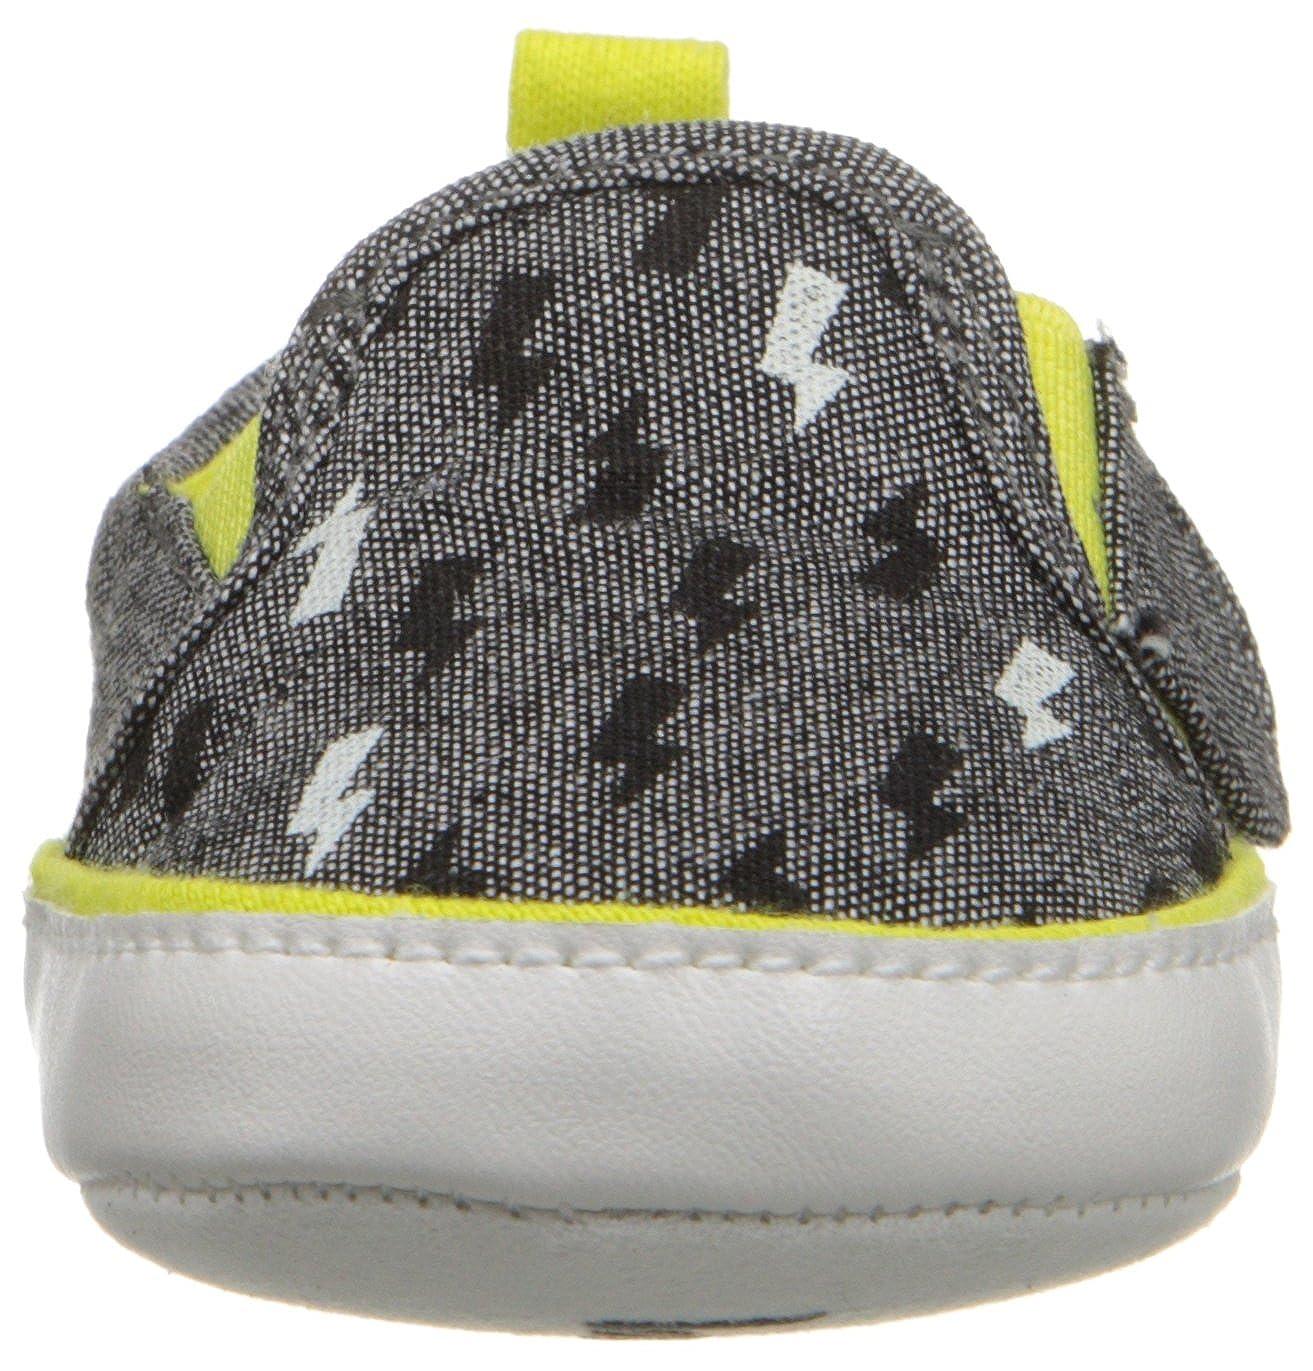 Infant Rosie Pope Kids Footwear Prewalker Bolt of Sunshine Crib Shoe